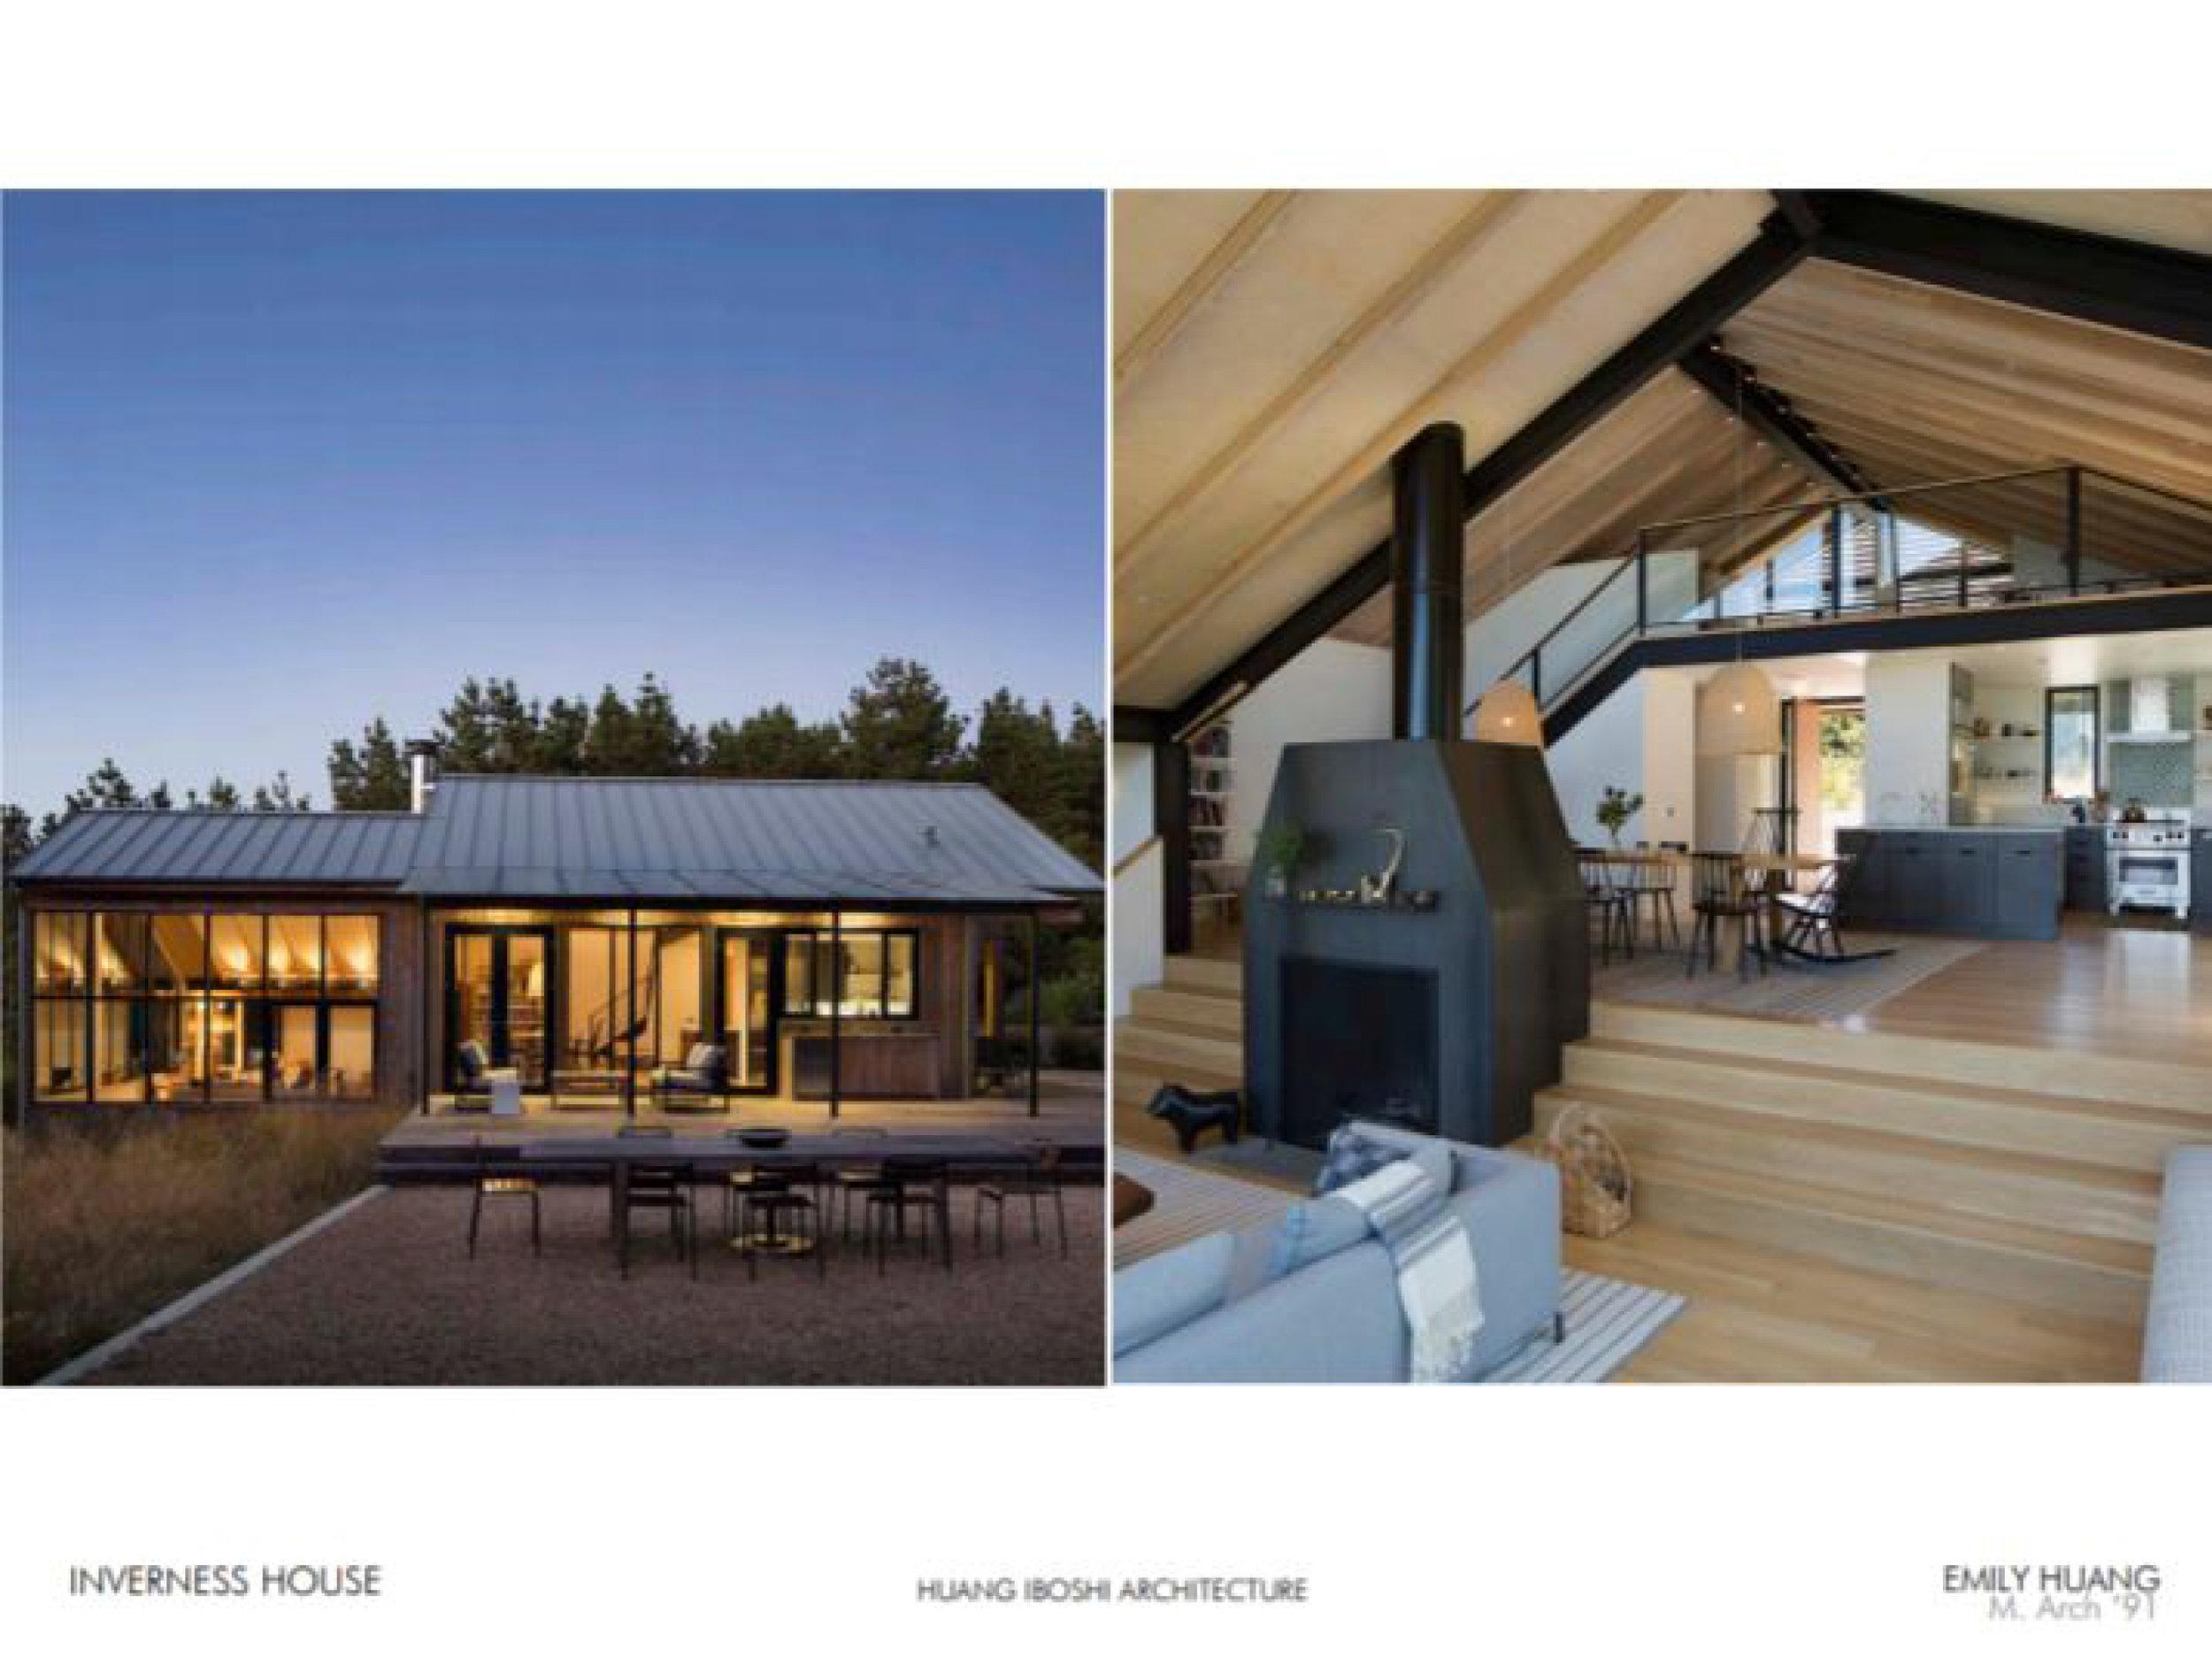 MIT ARCHITECTURE 150 SAN FRANCISCO SLIDESHOW-84 copy.jpg